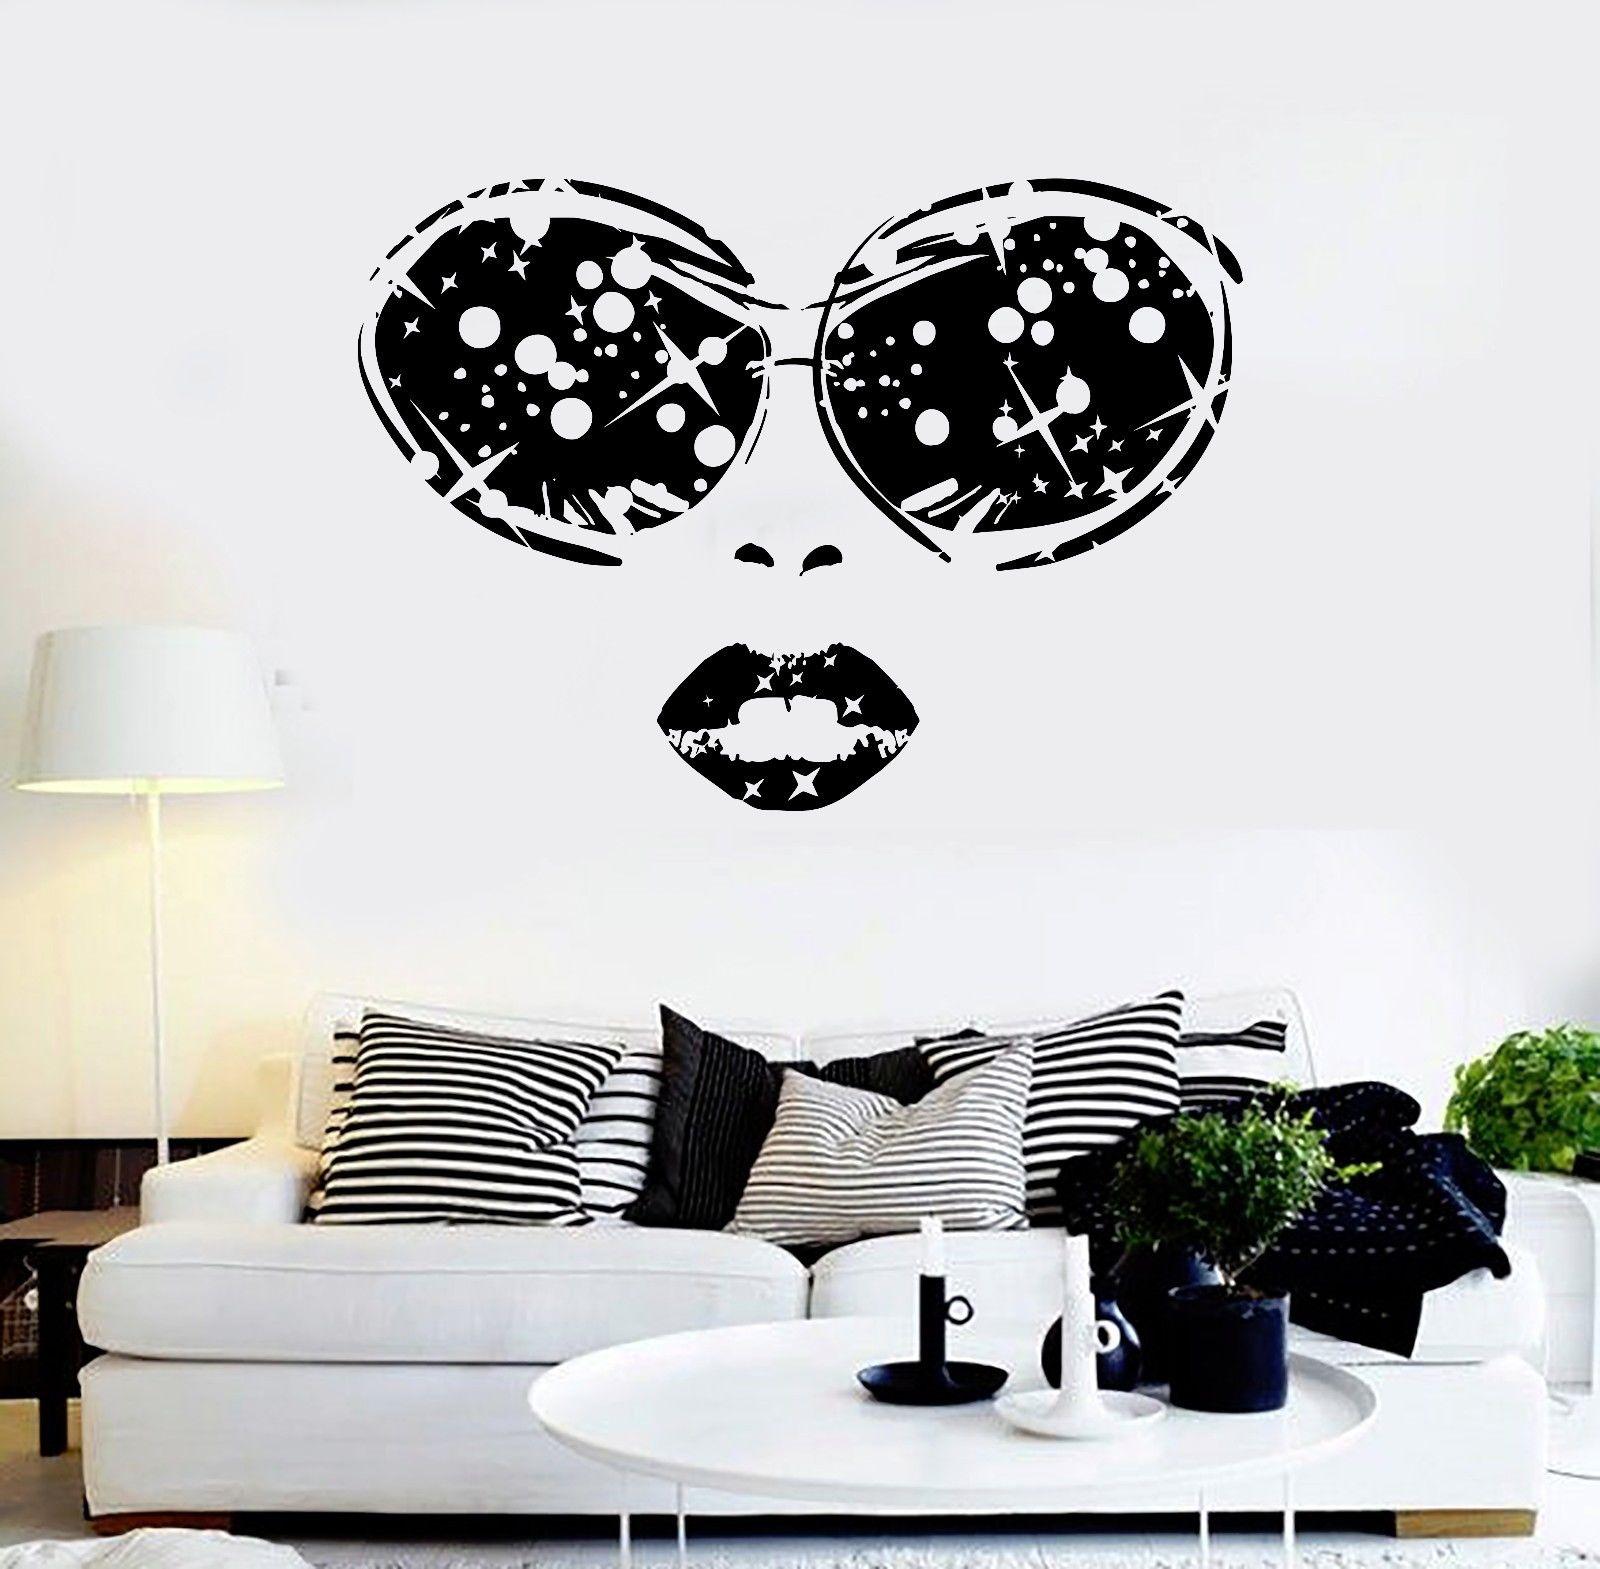 Eyes wall stickers wow modern beauty salon valentine wall decoration - Vinyl Decal Sexy Woman Face Glasses Lips Girl Beauty Salon Wall Sticker China